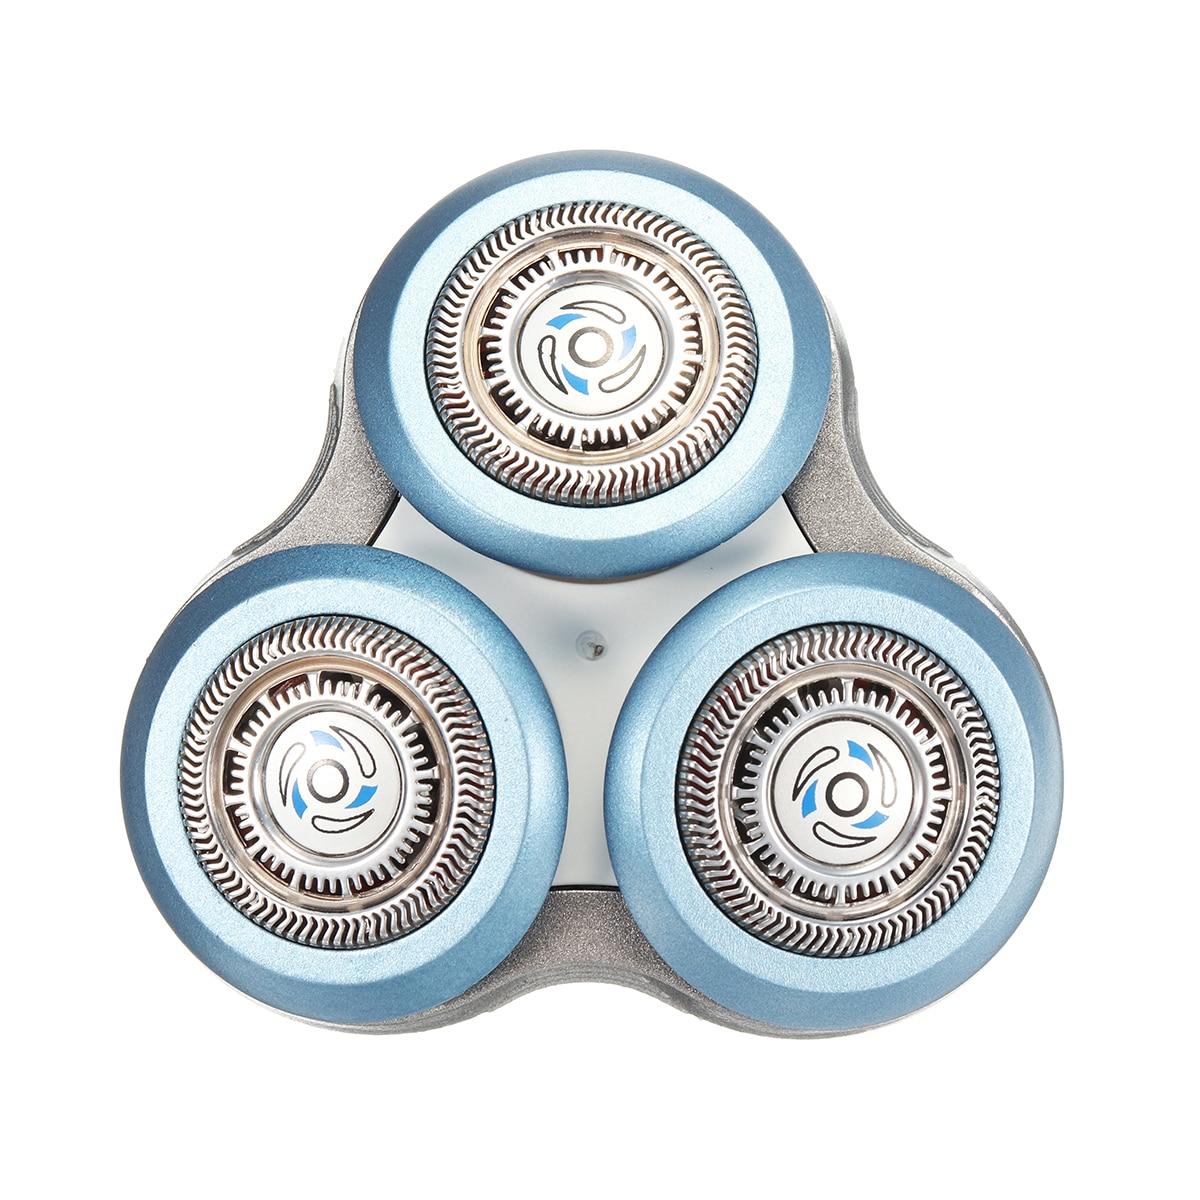 NEW Replacement Shaver Head for Philips SH90/52 SH70/52 9000 7000 RQ12 RQ11 Series Shaving Unit Razor